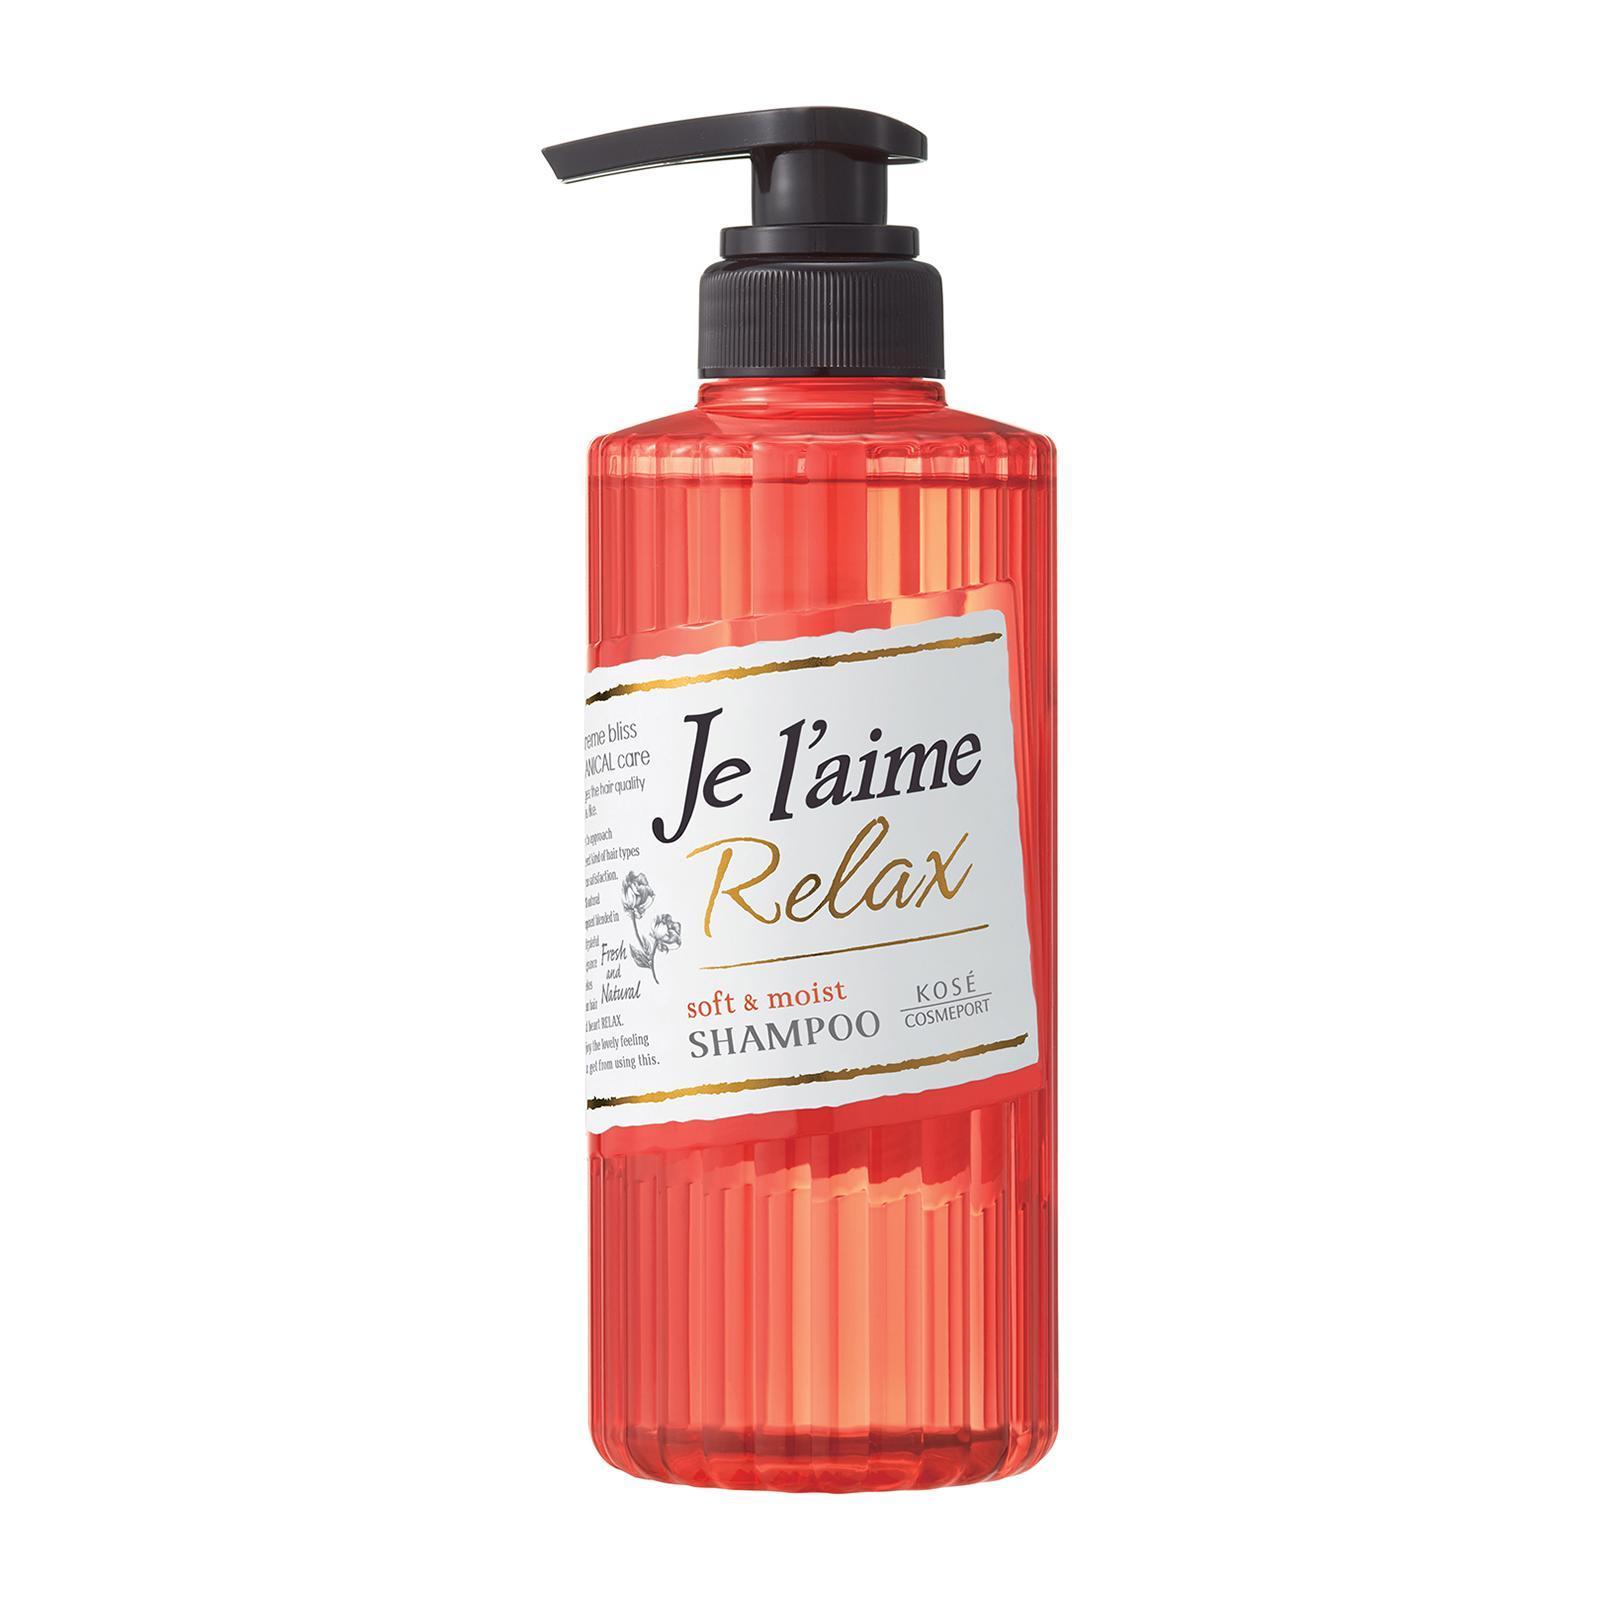 Kose Cosmeport Je L'aime Relax Shampoo Soft and Moist